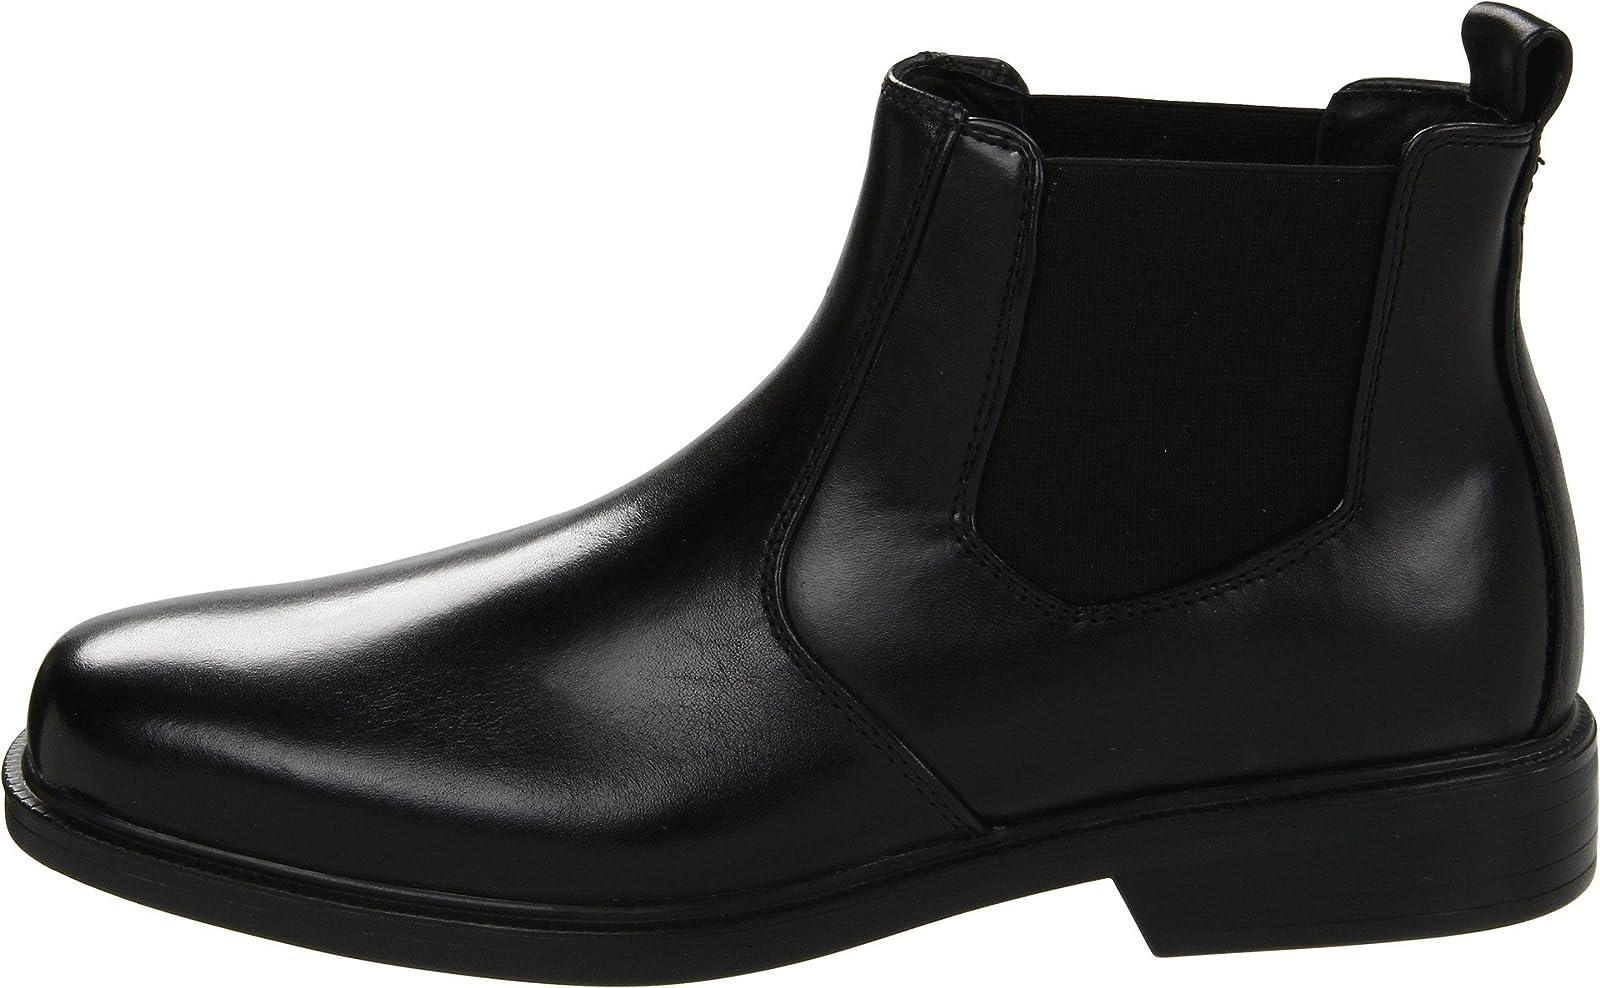 Giorgio Brutini Men's Chelsea Dress Boot Cormac Black - 5